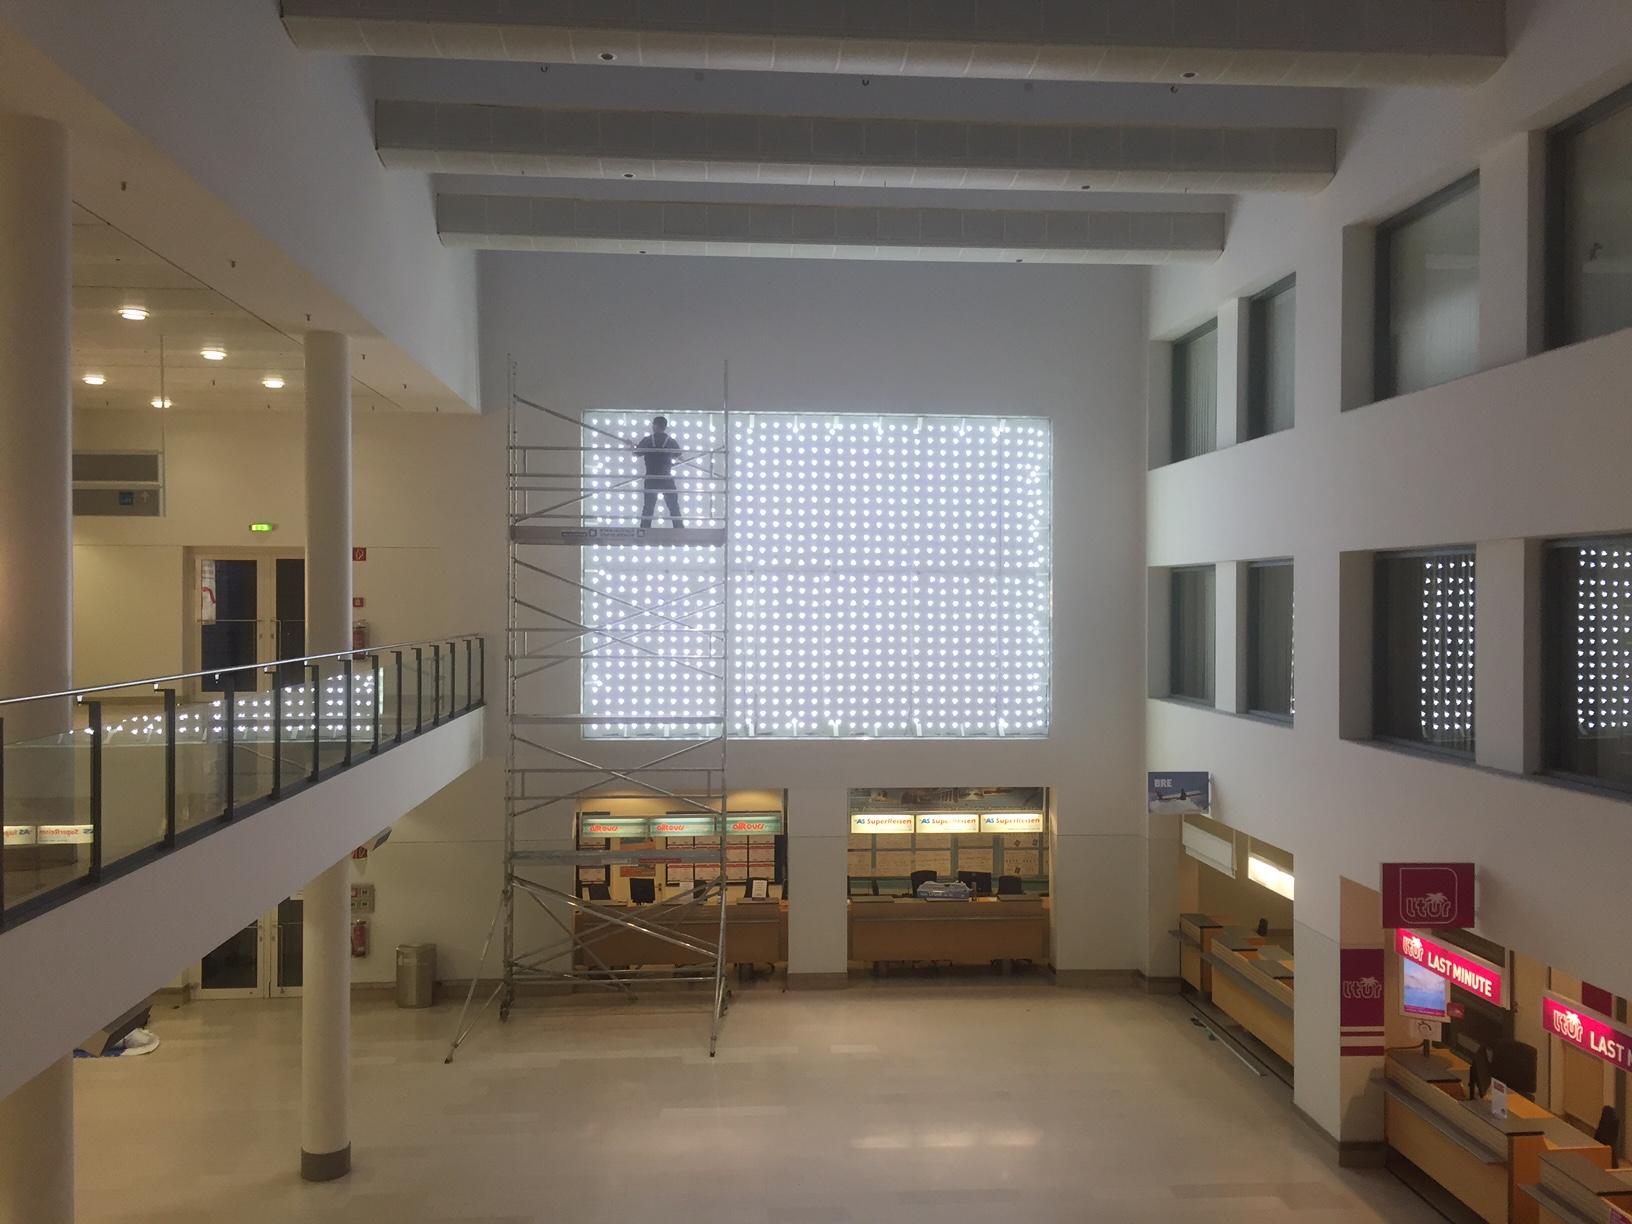 LED Leuchkasten 5m x 7m